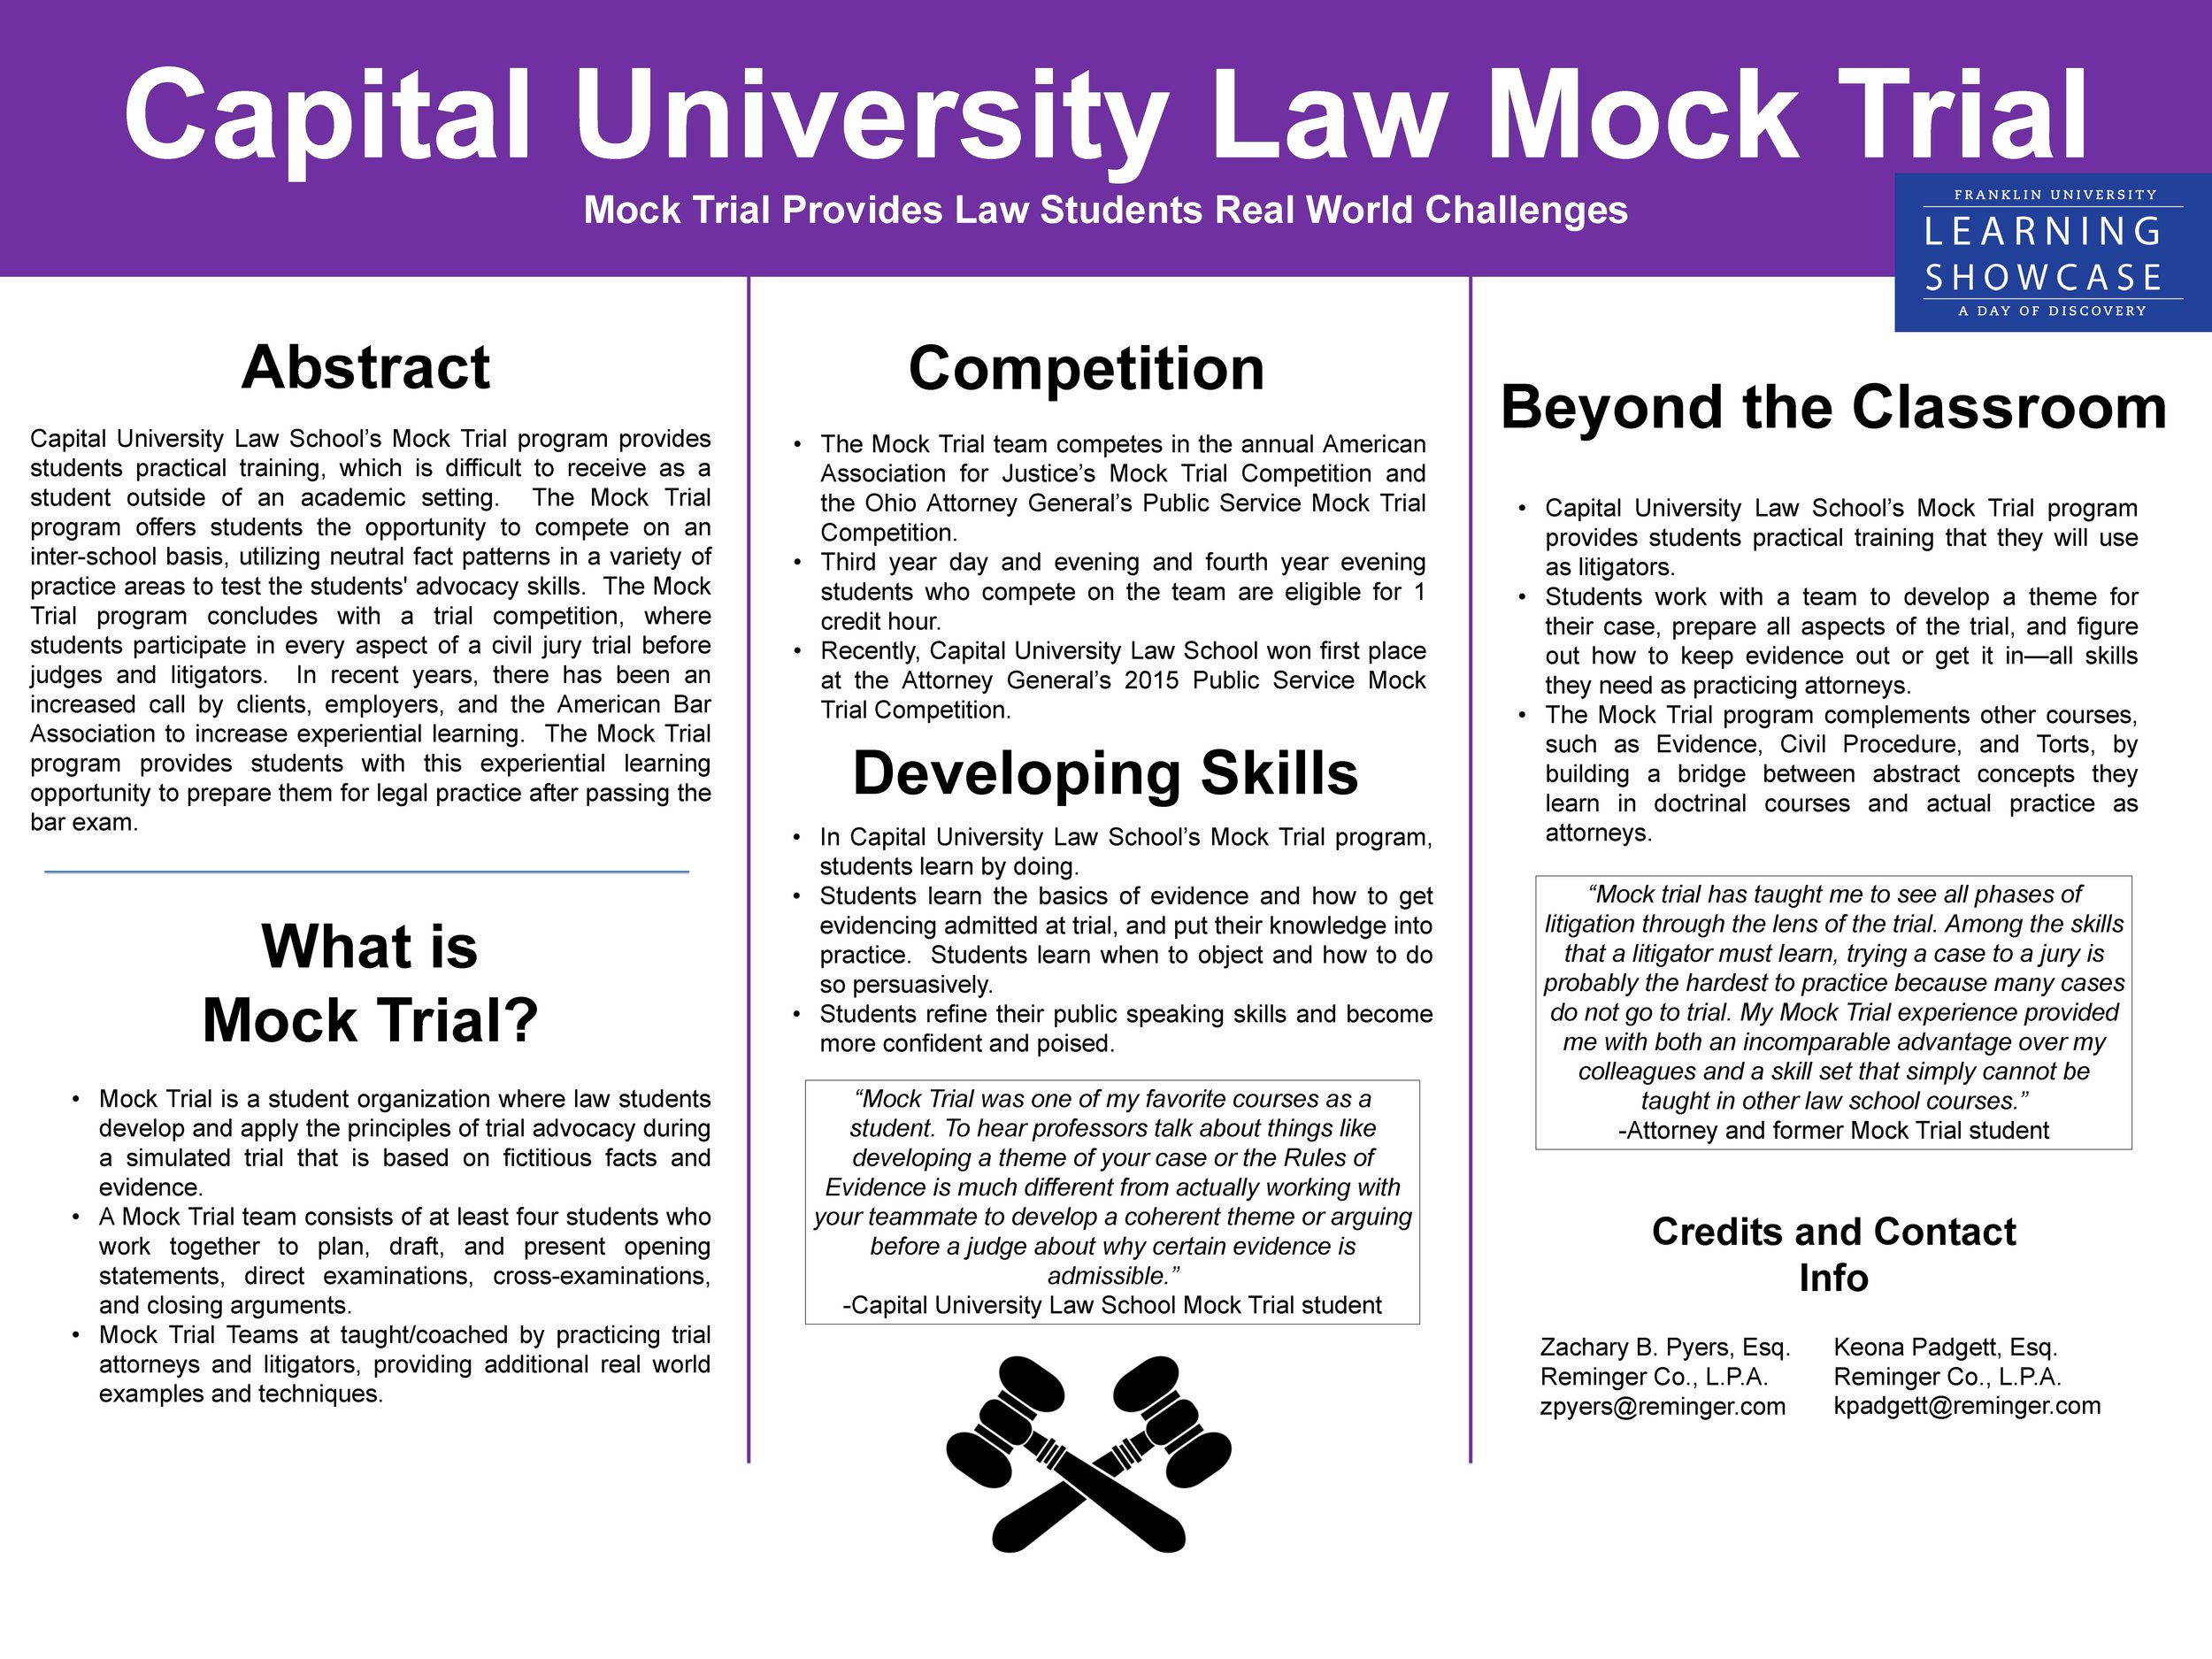 Z  Pyers- Mock Trial Poster.jpg